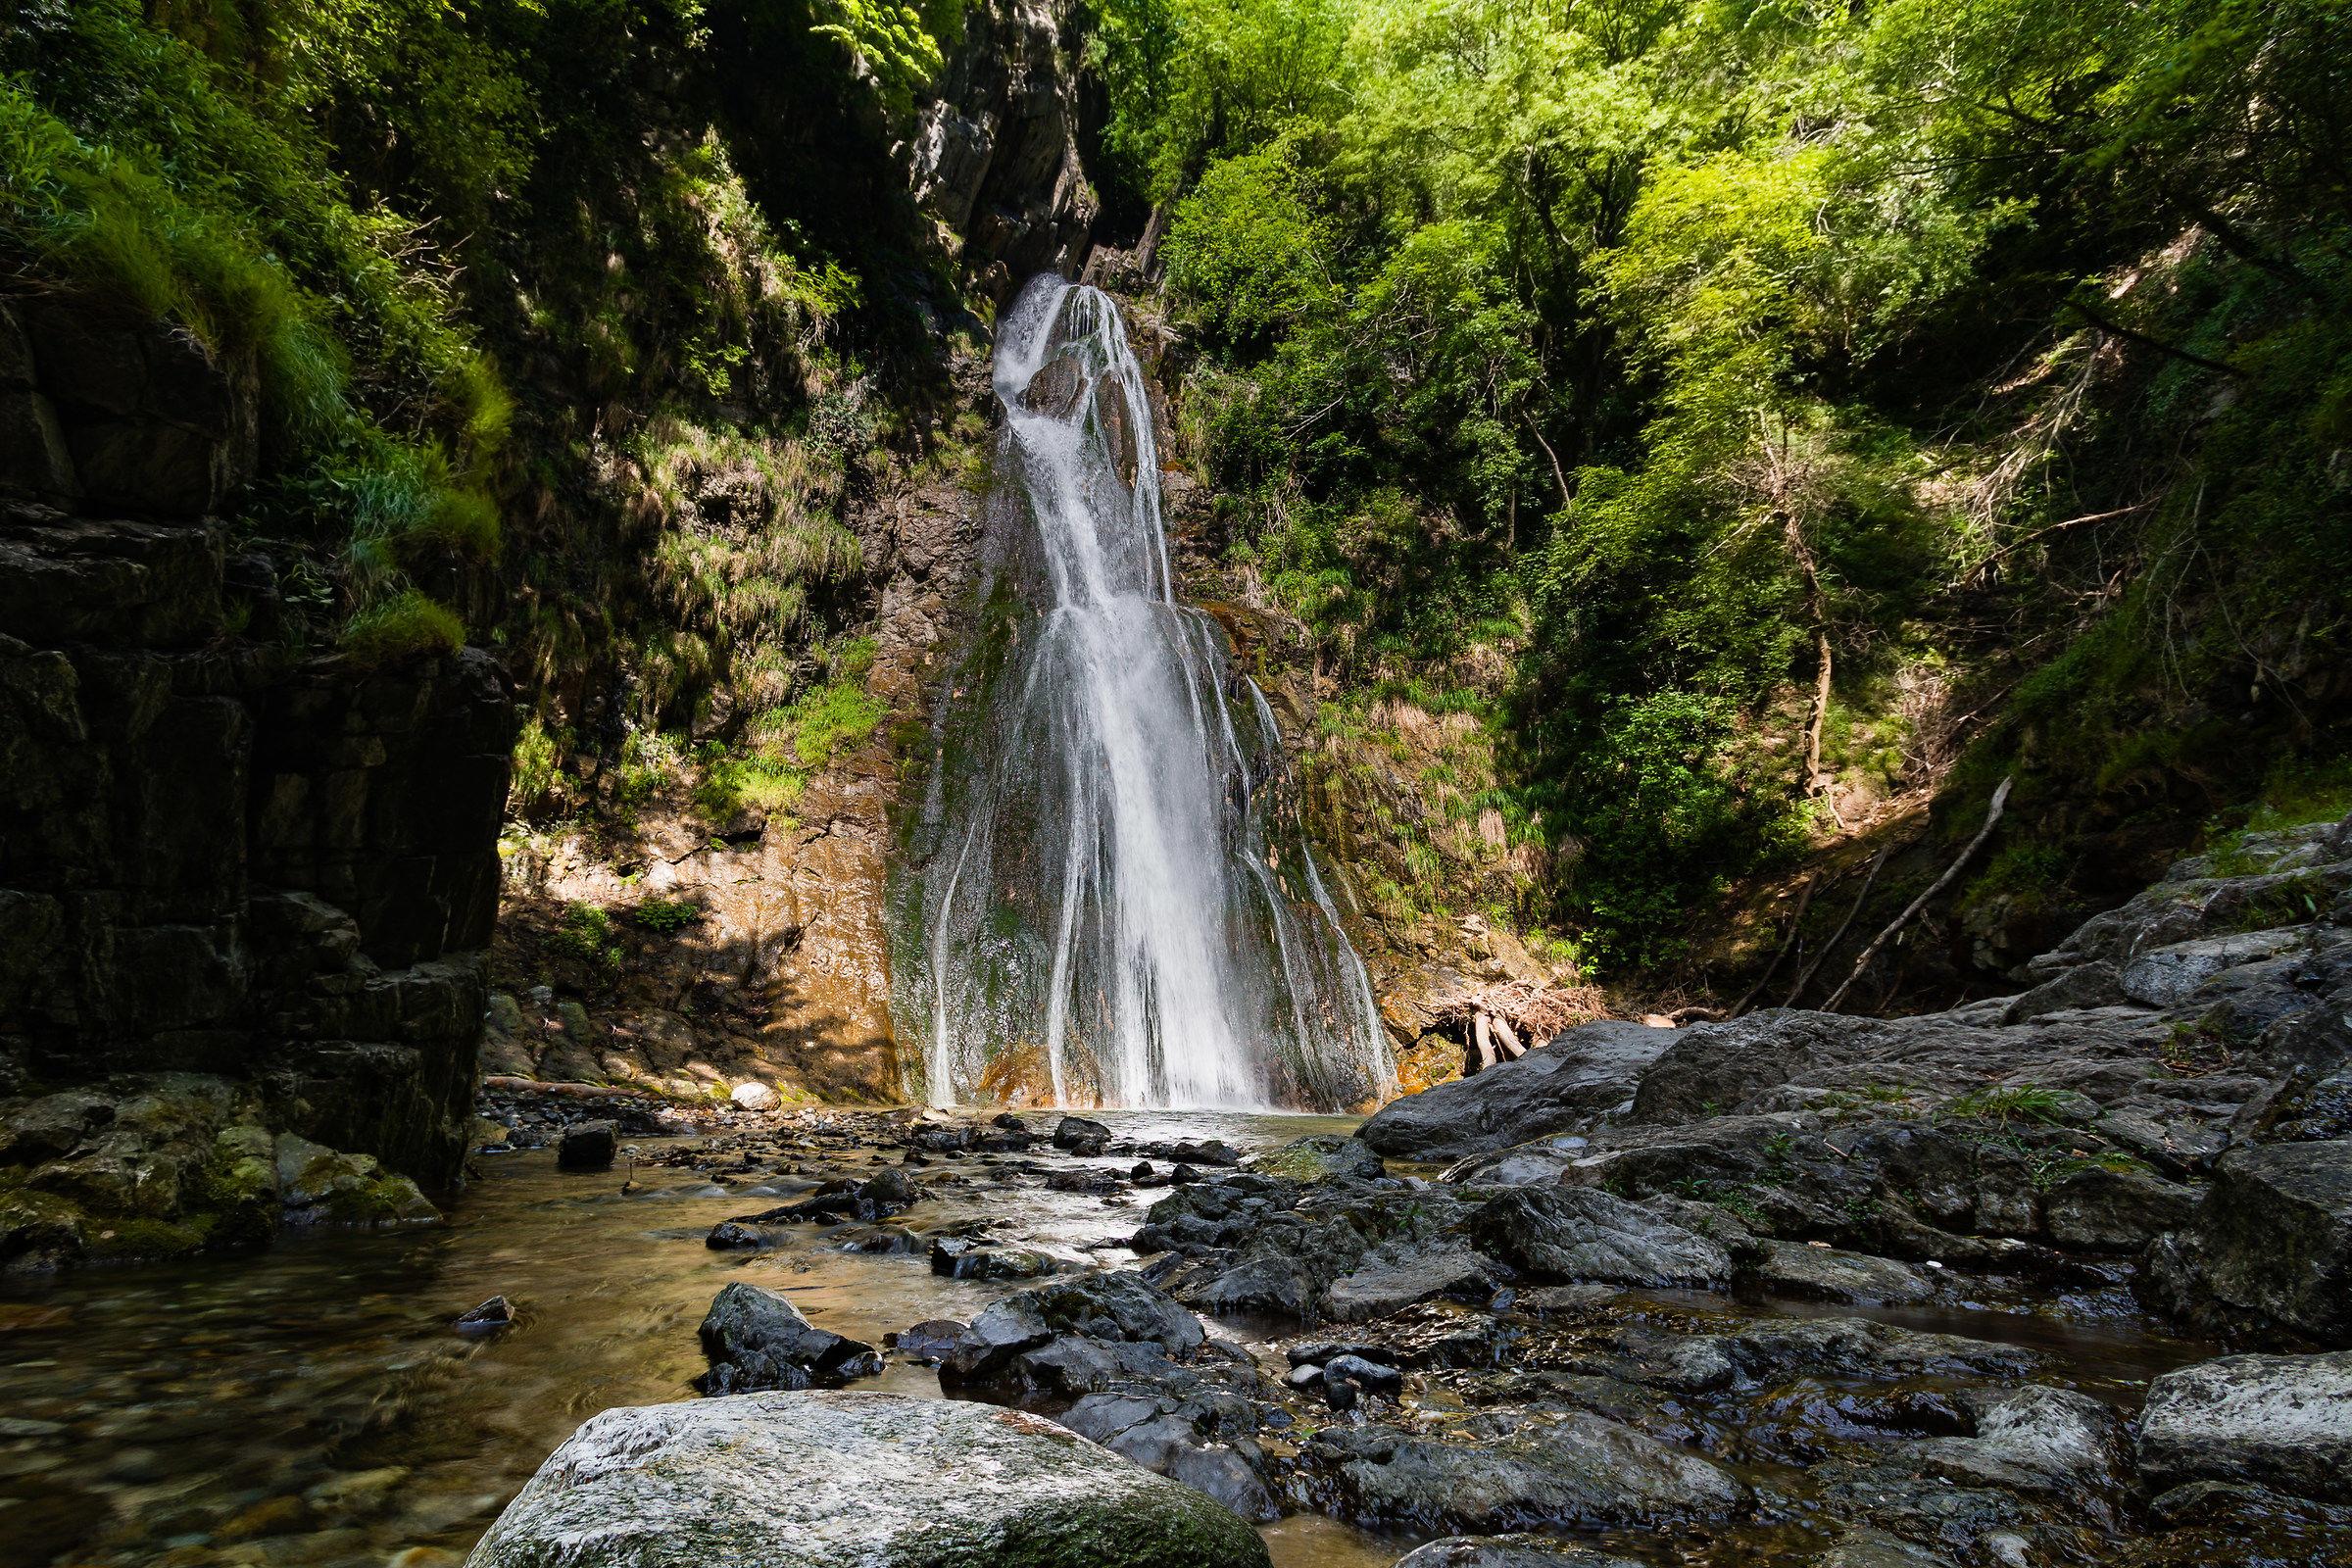 Second waterfall of Cittiglio...